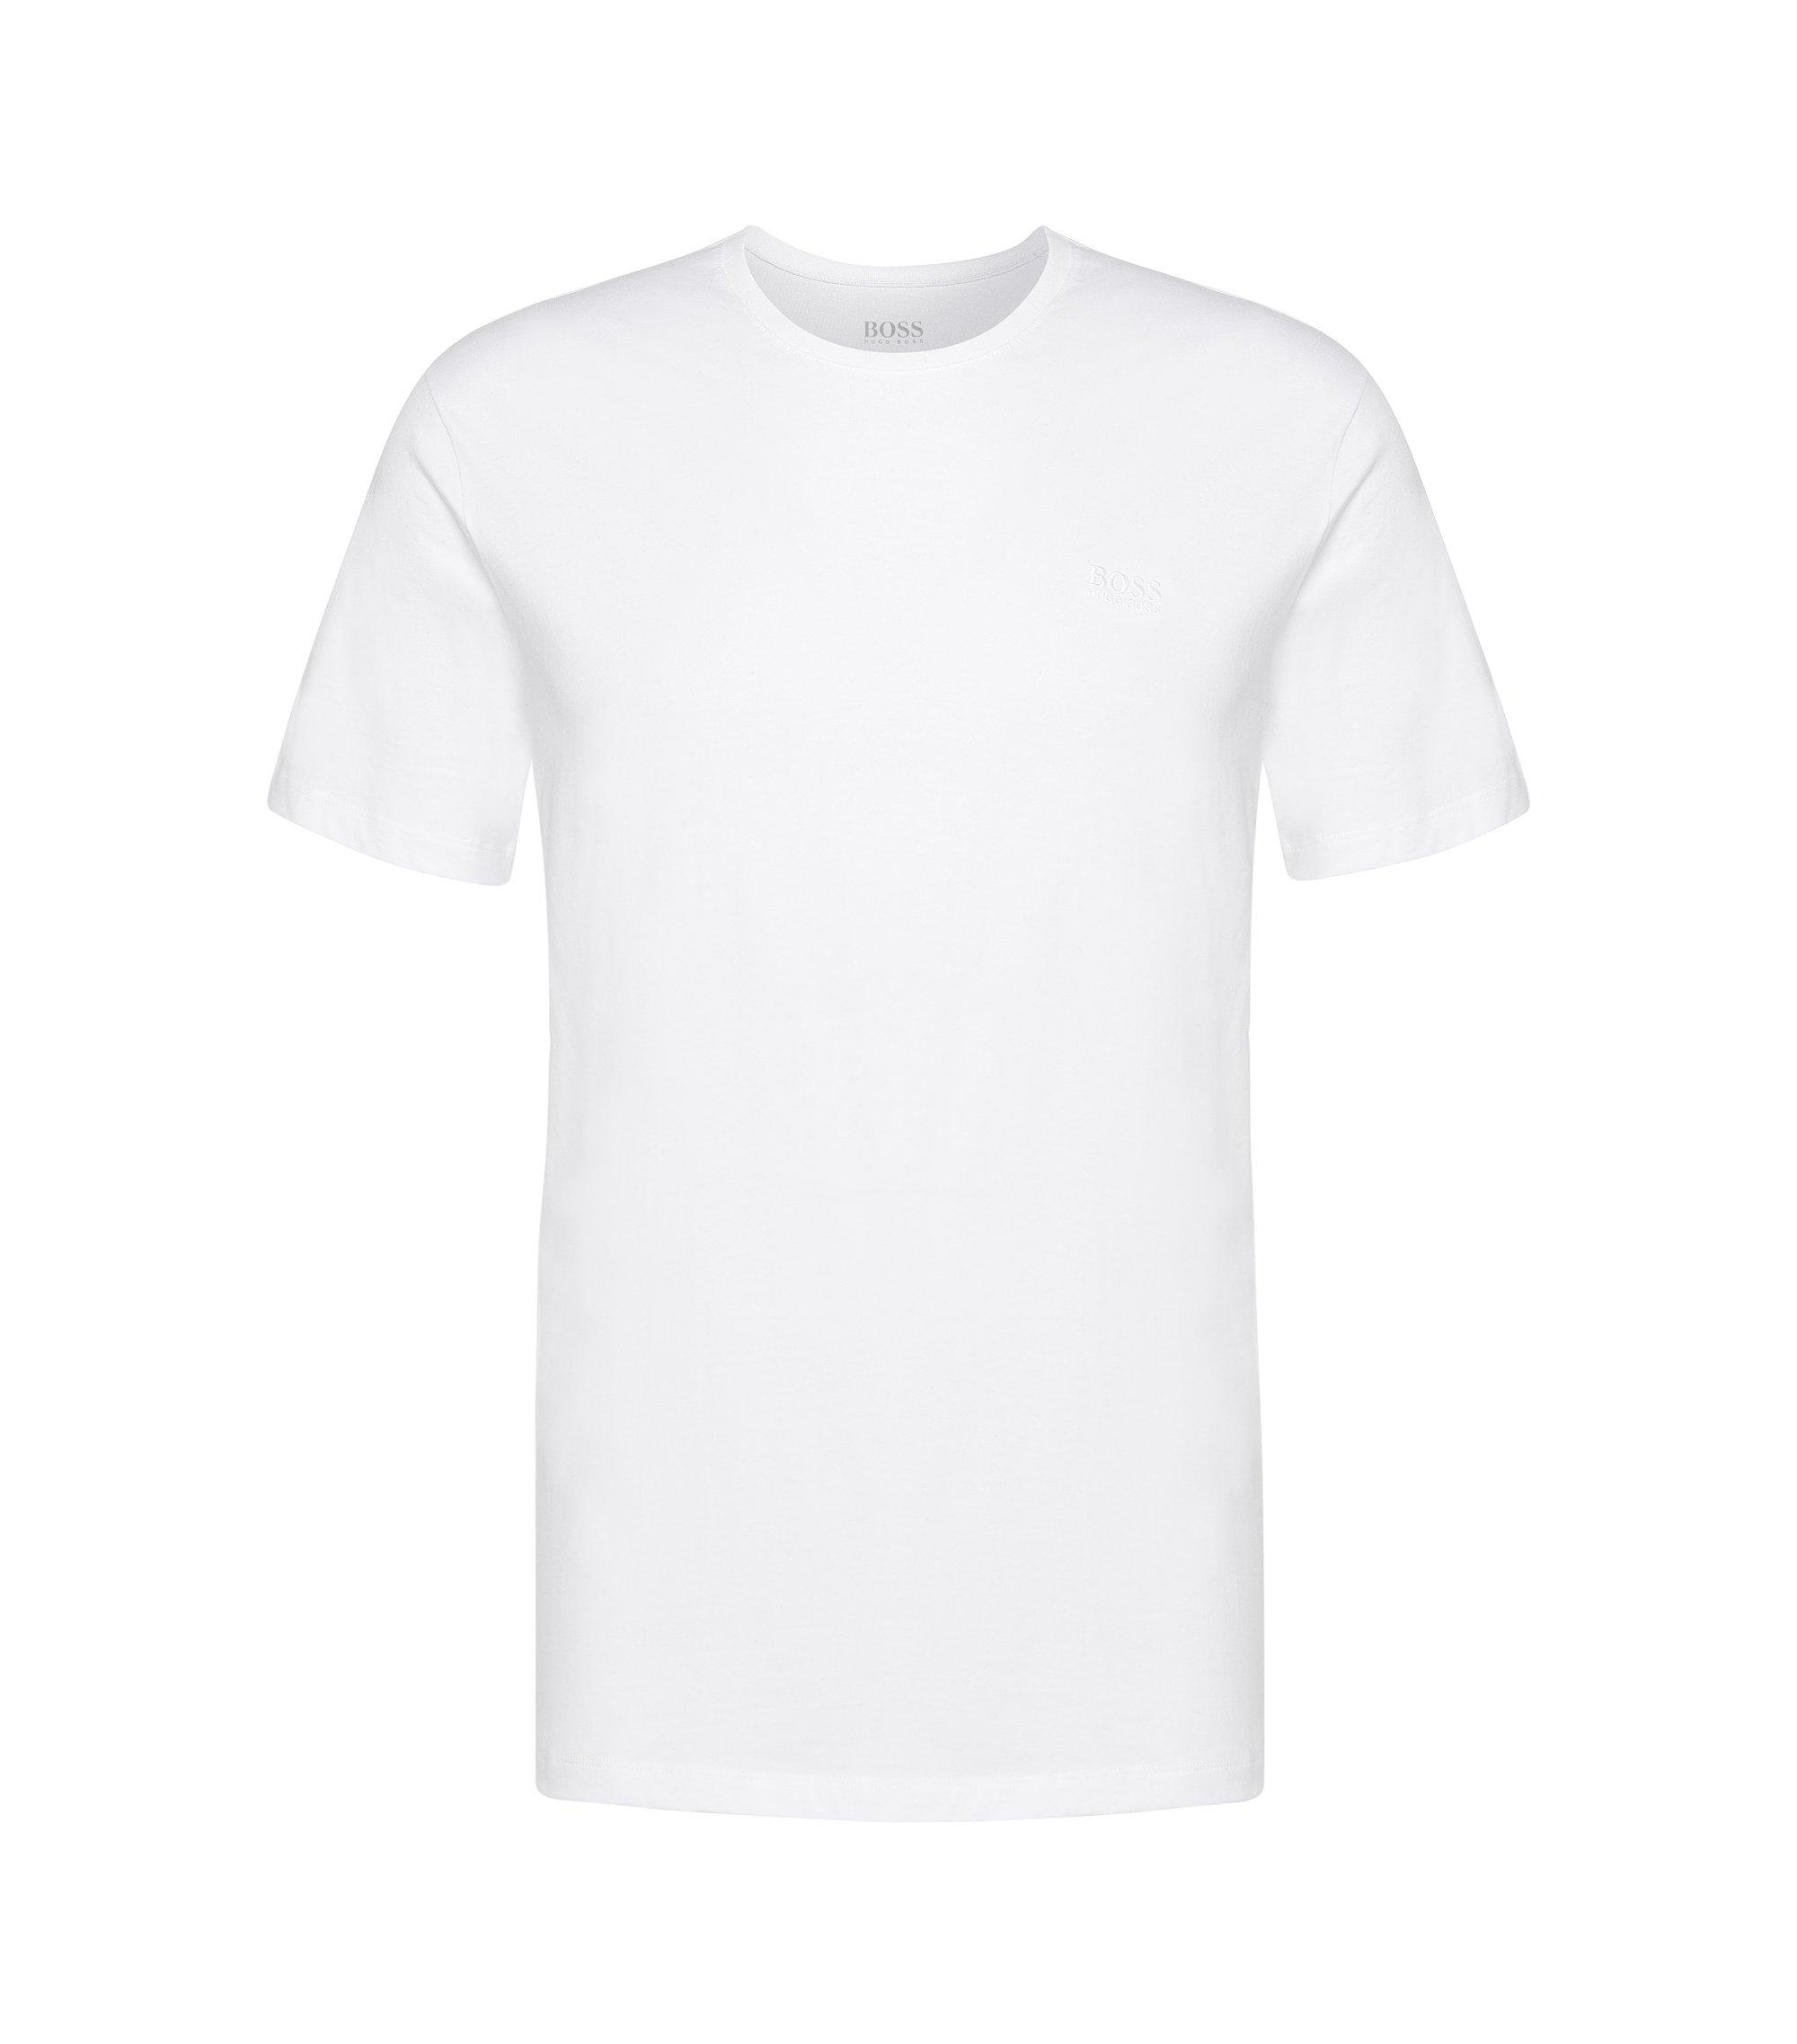 Relaxed-Fit Baumwoll-Shirt mit Rundhalsausschnitt, Weiß